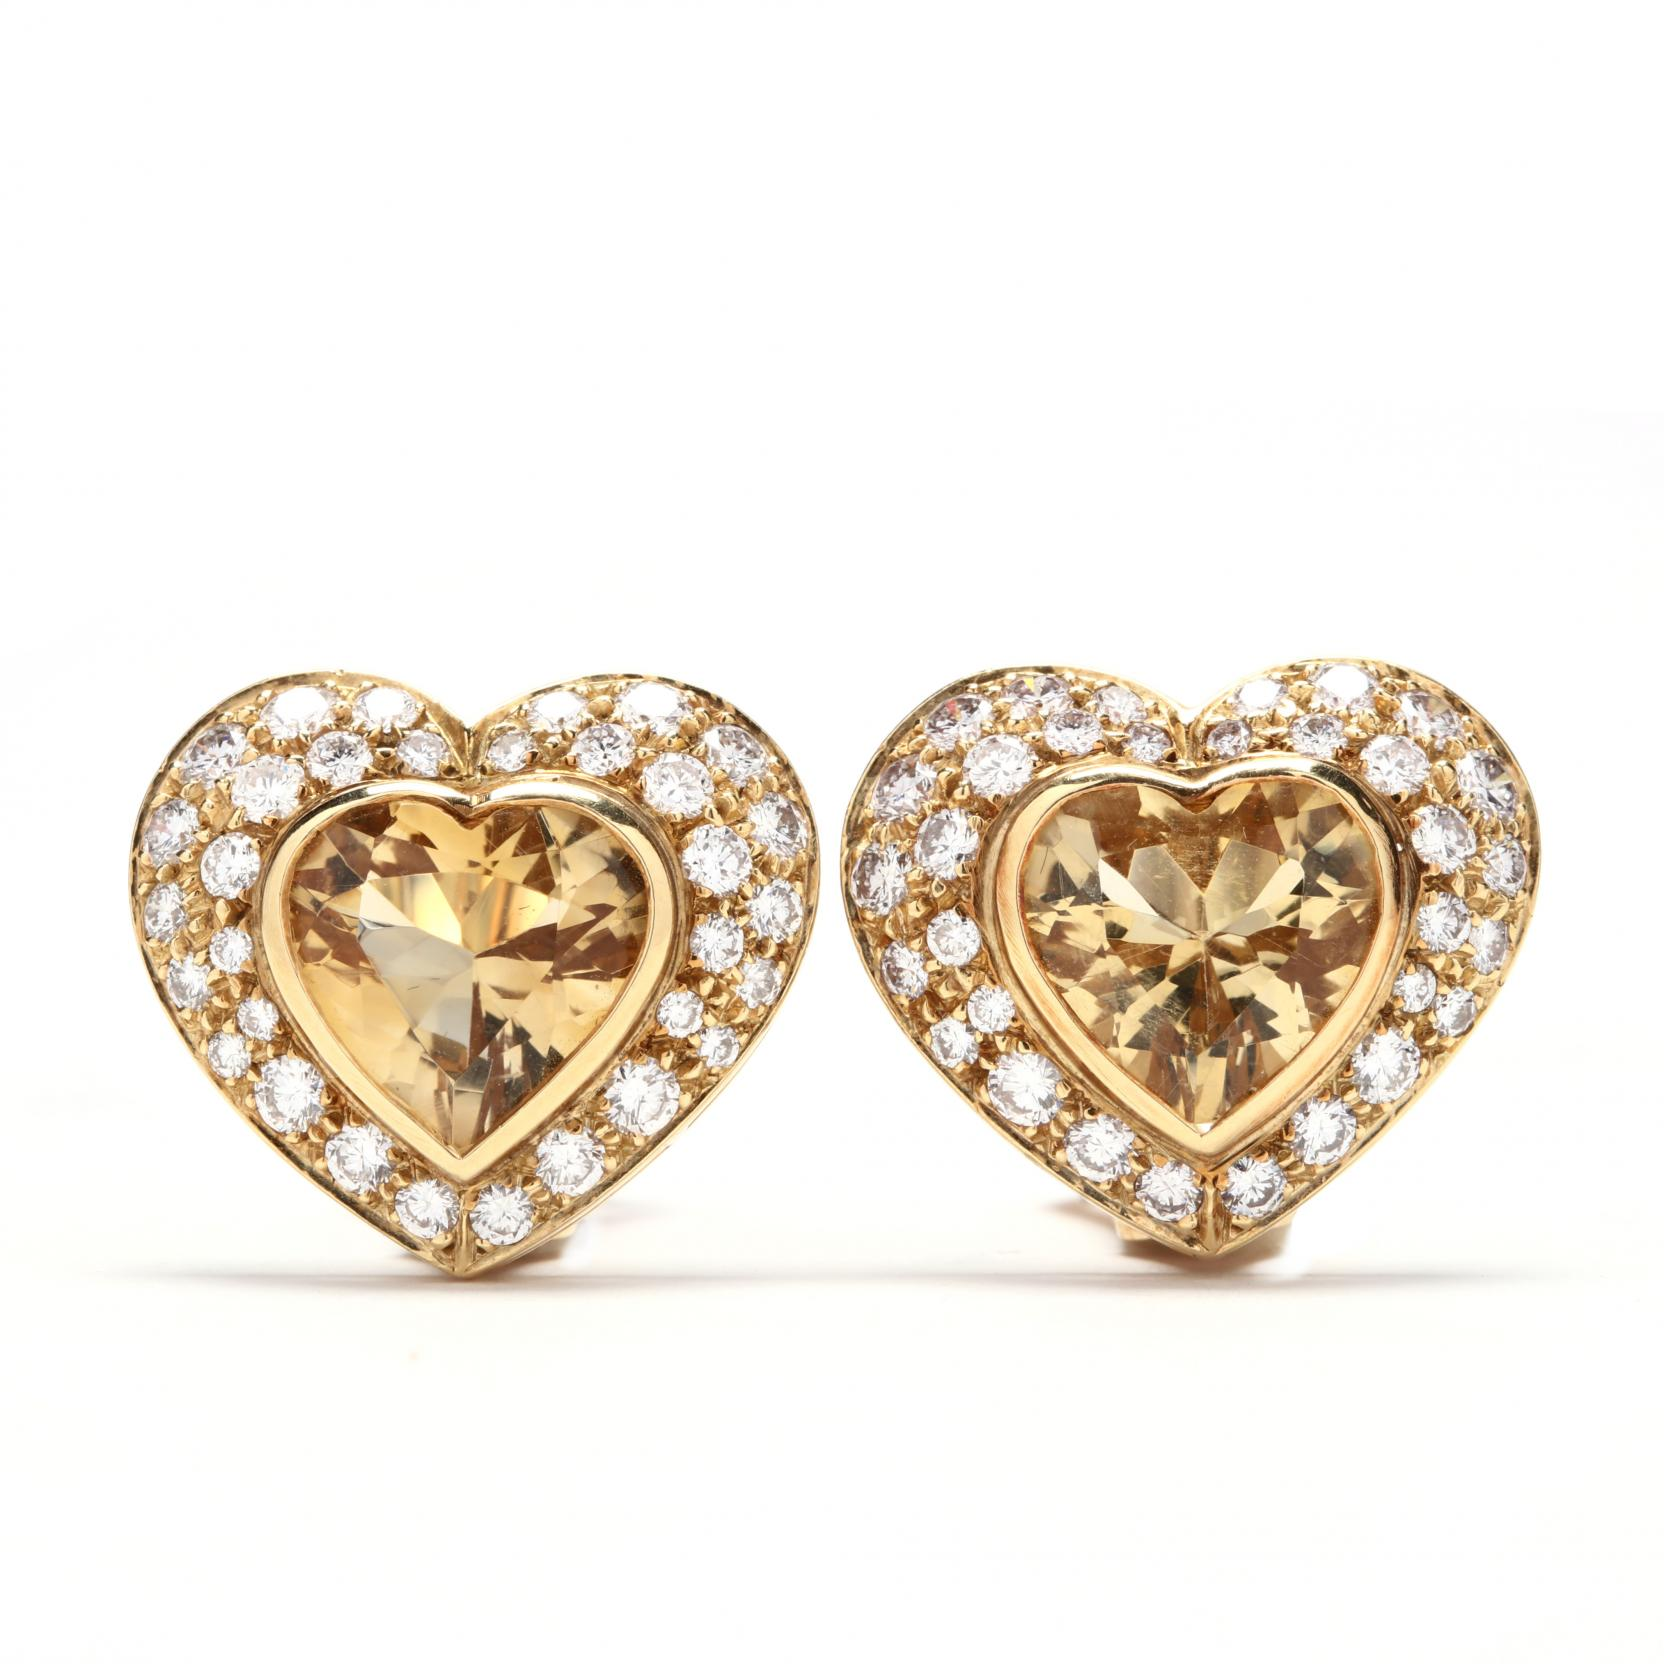 18kt-gold-citrine-and-diamond-earrings